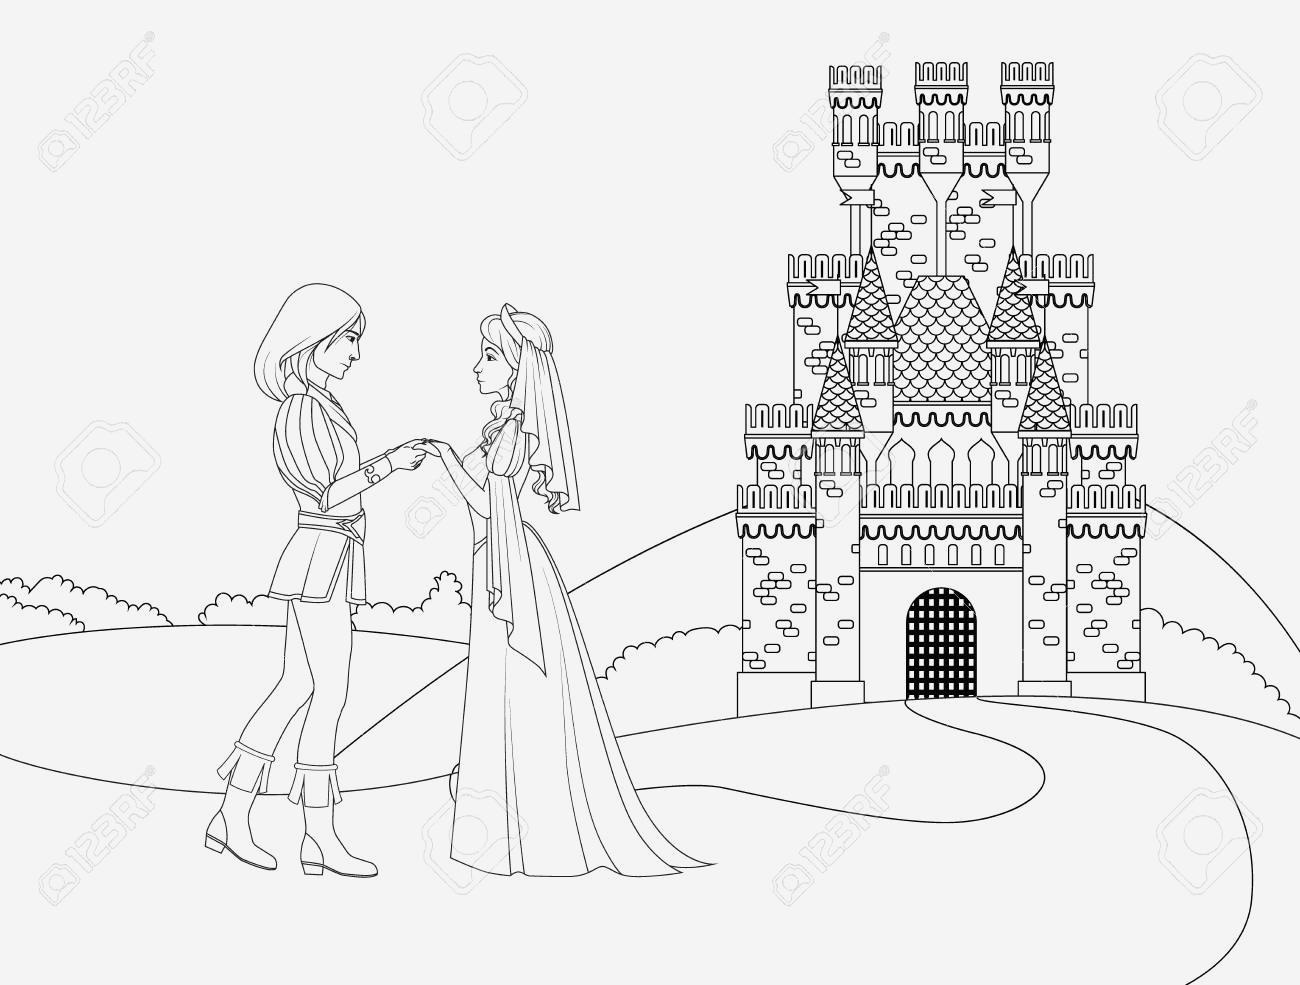 Coloriage Chateau De Princesse Gratuit Archives - Coloriages dedans Coloriage À Imprimer Chateau De Princesse